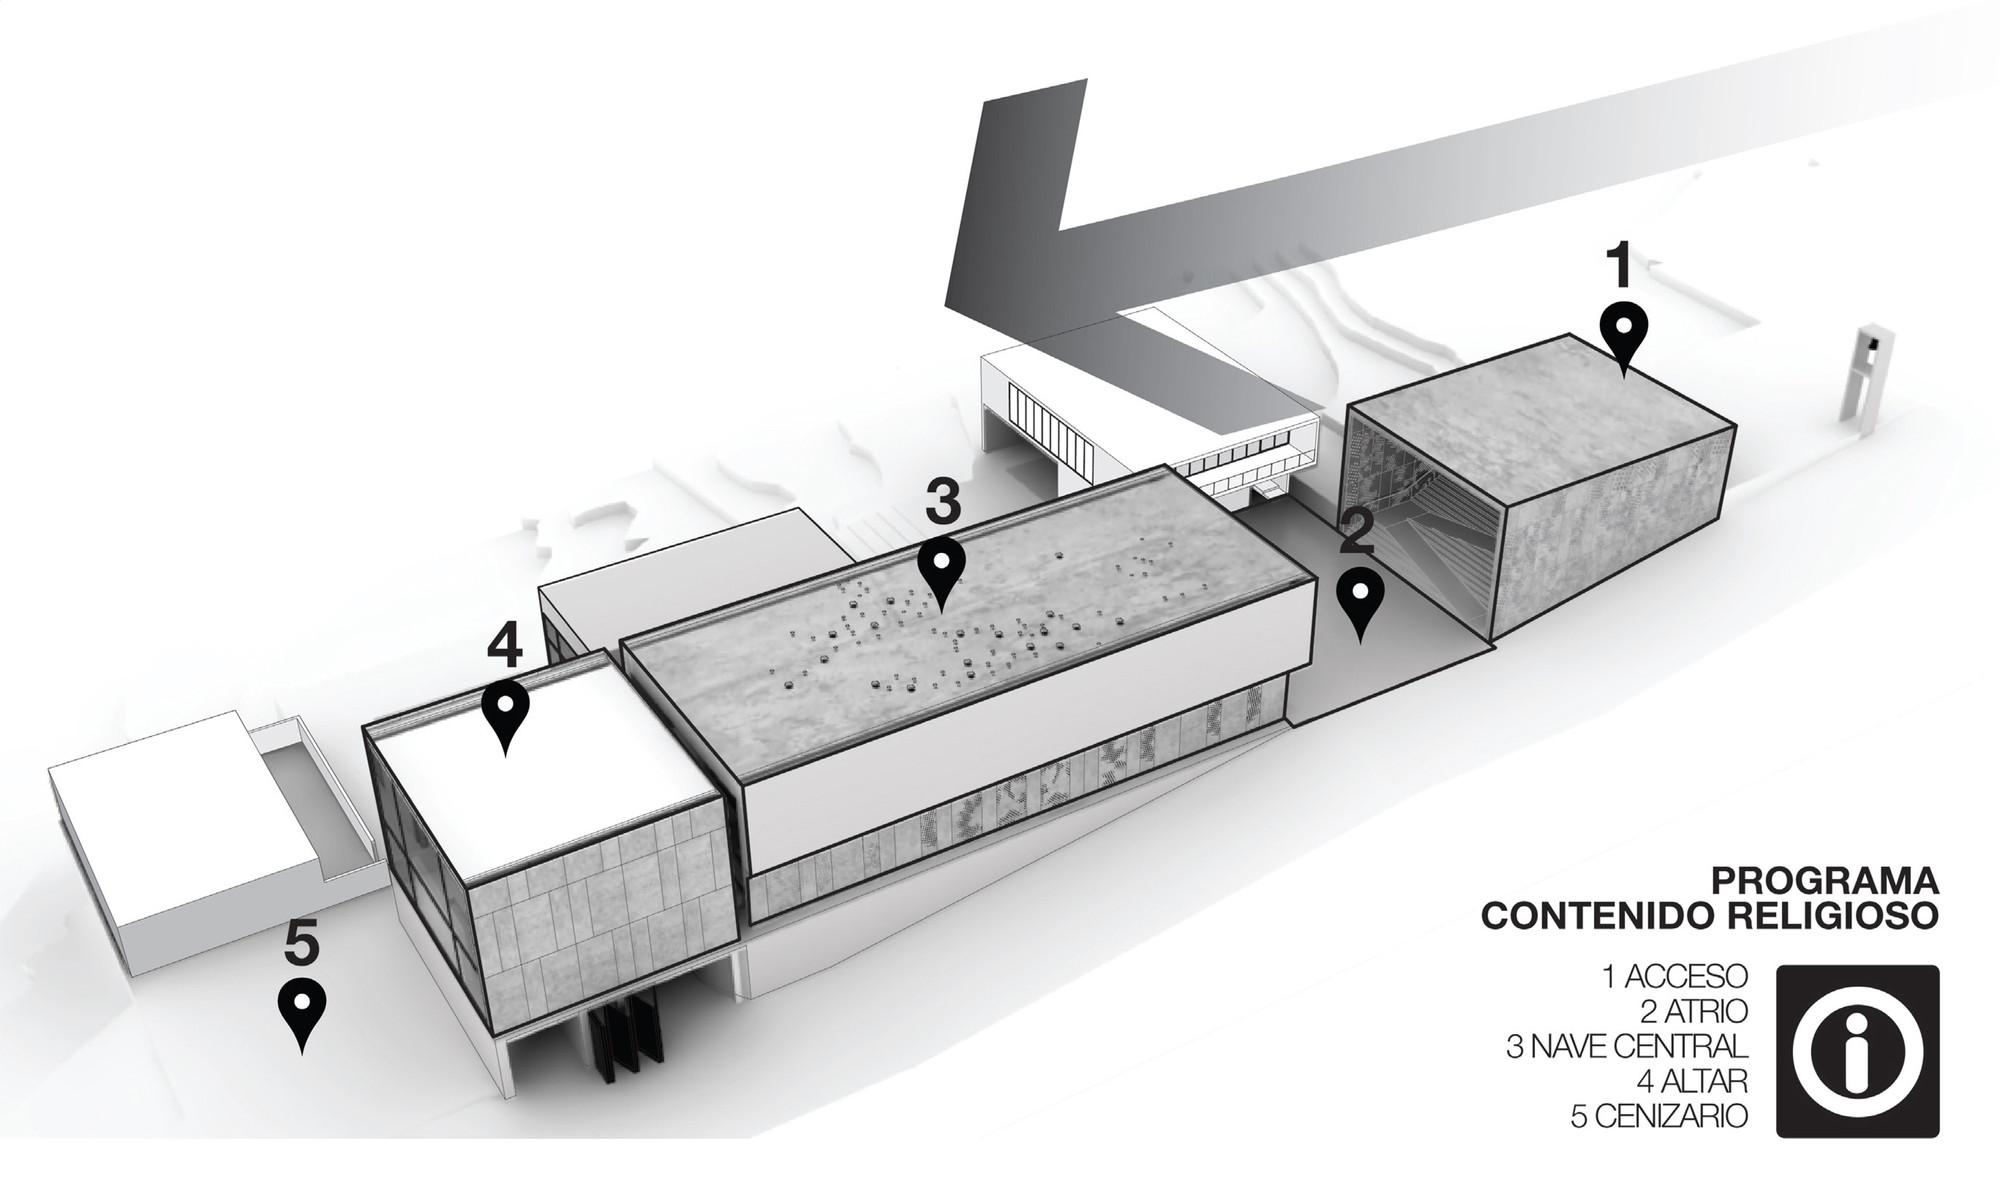 Contenido religioso. Image Courtesy of Taller de arquitectura Singular